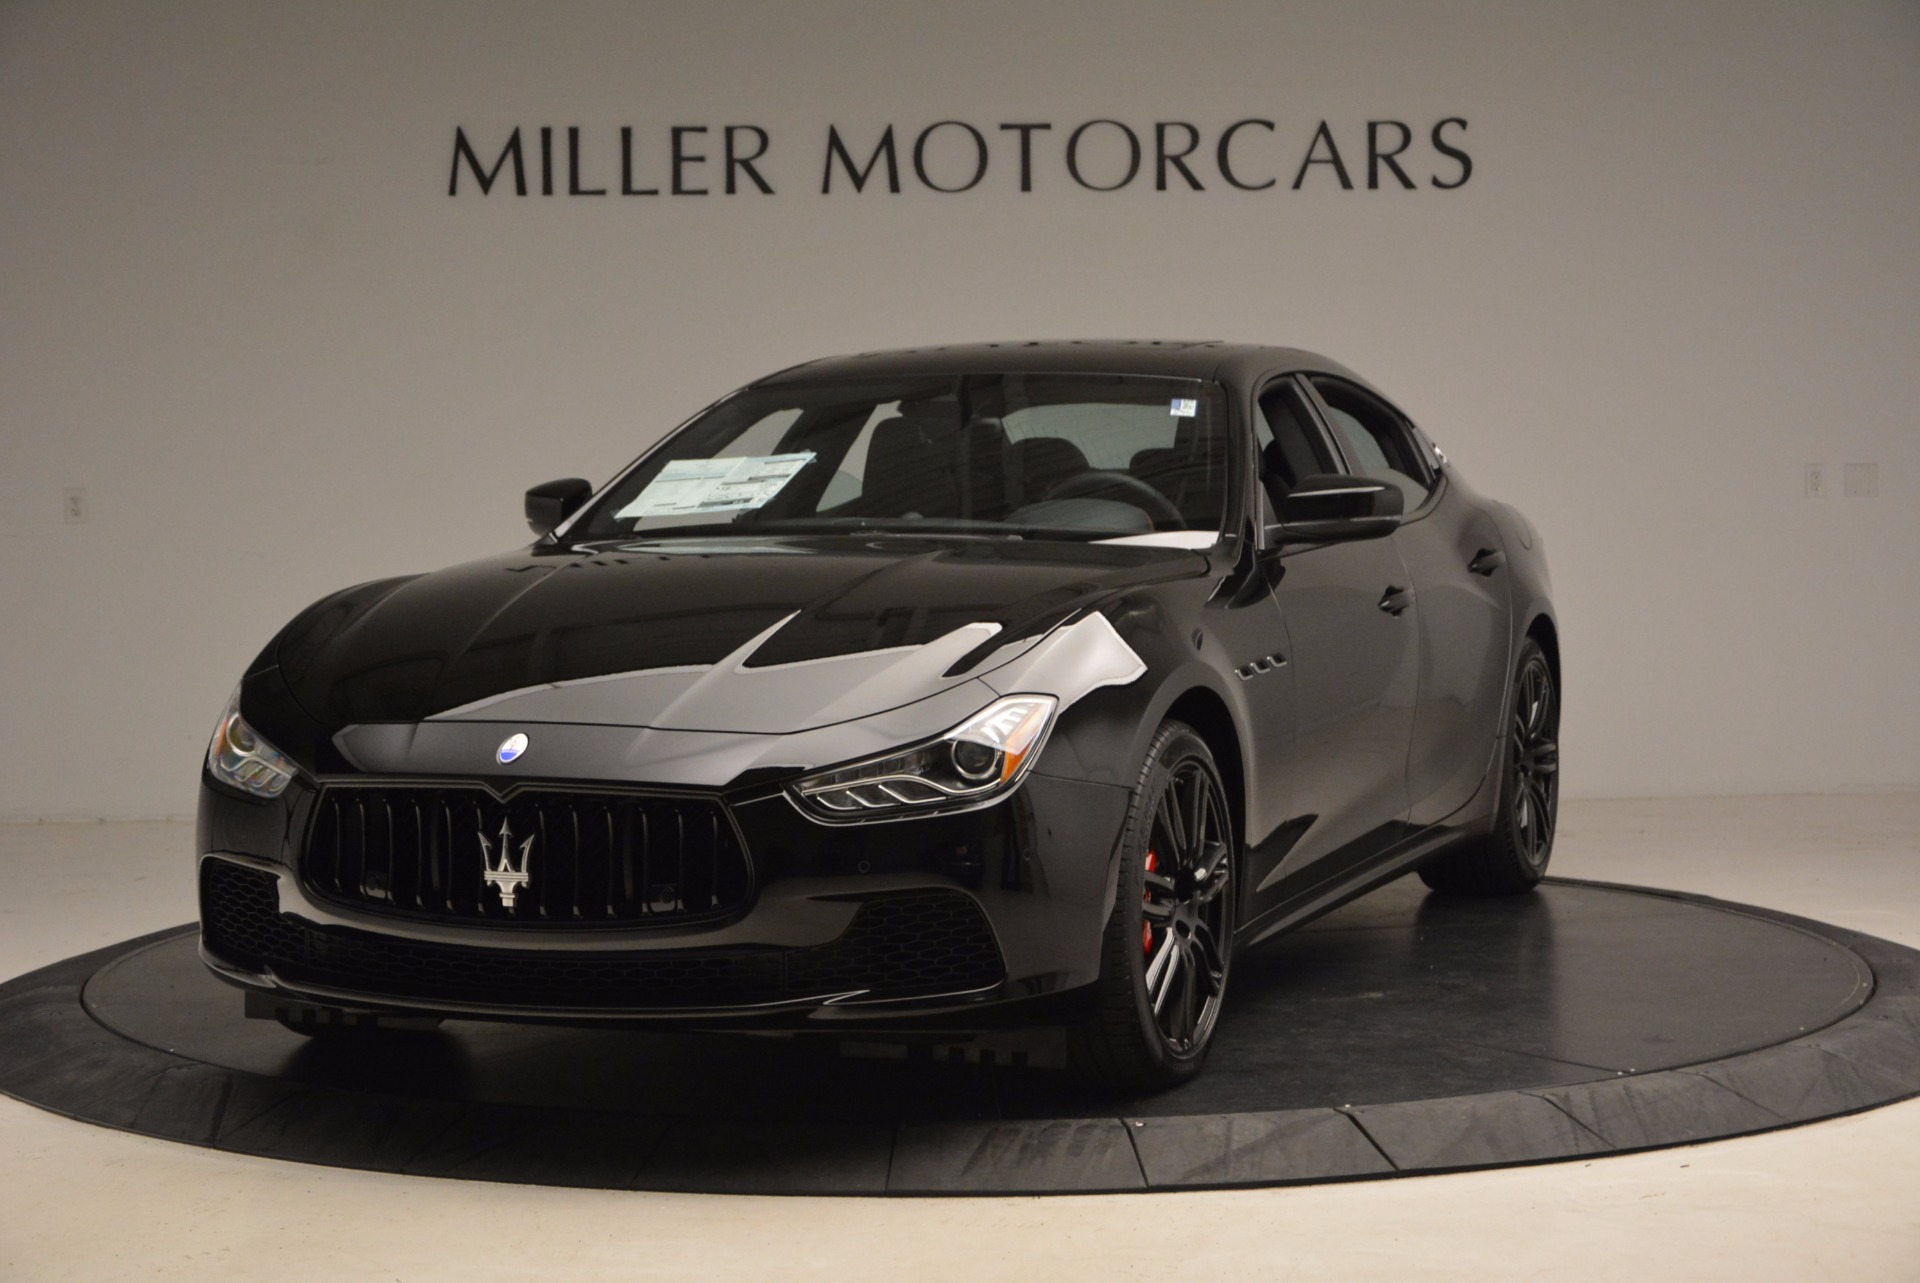 New 2017 Maserati Ghibli Nerissimo Edition S Q4 For Sale In Westport, CT 1419_main